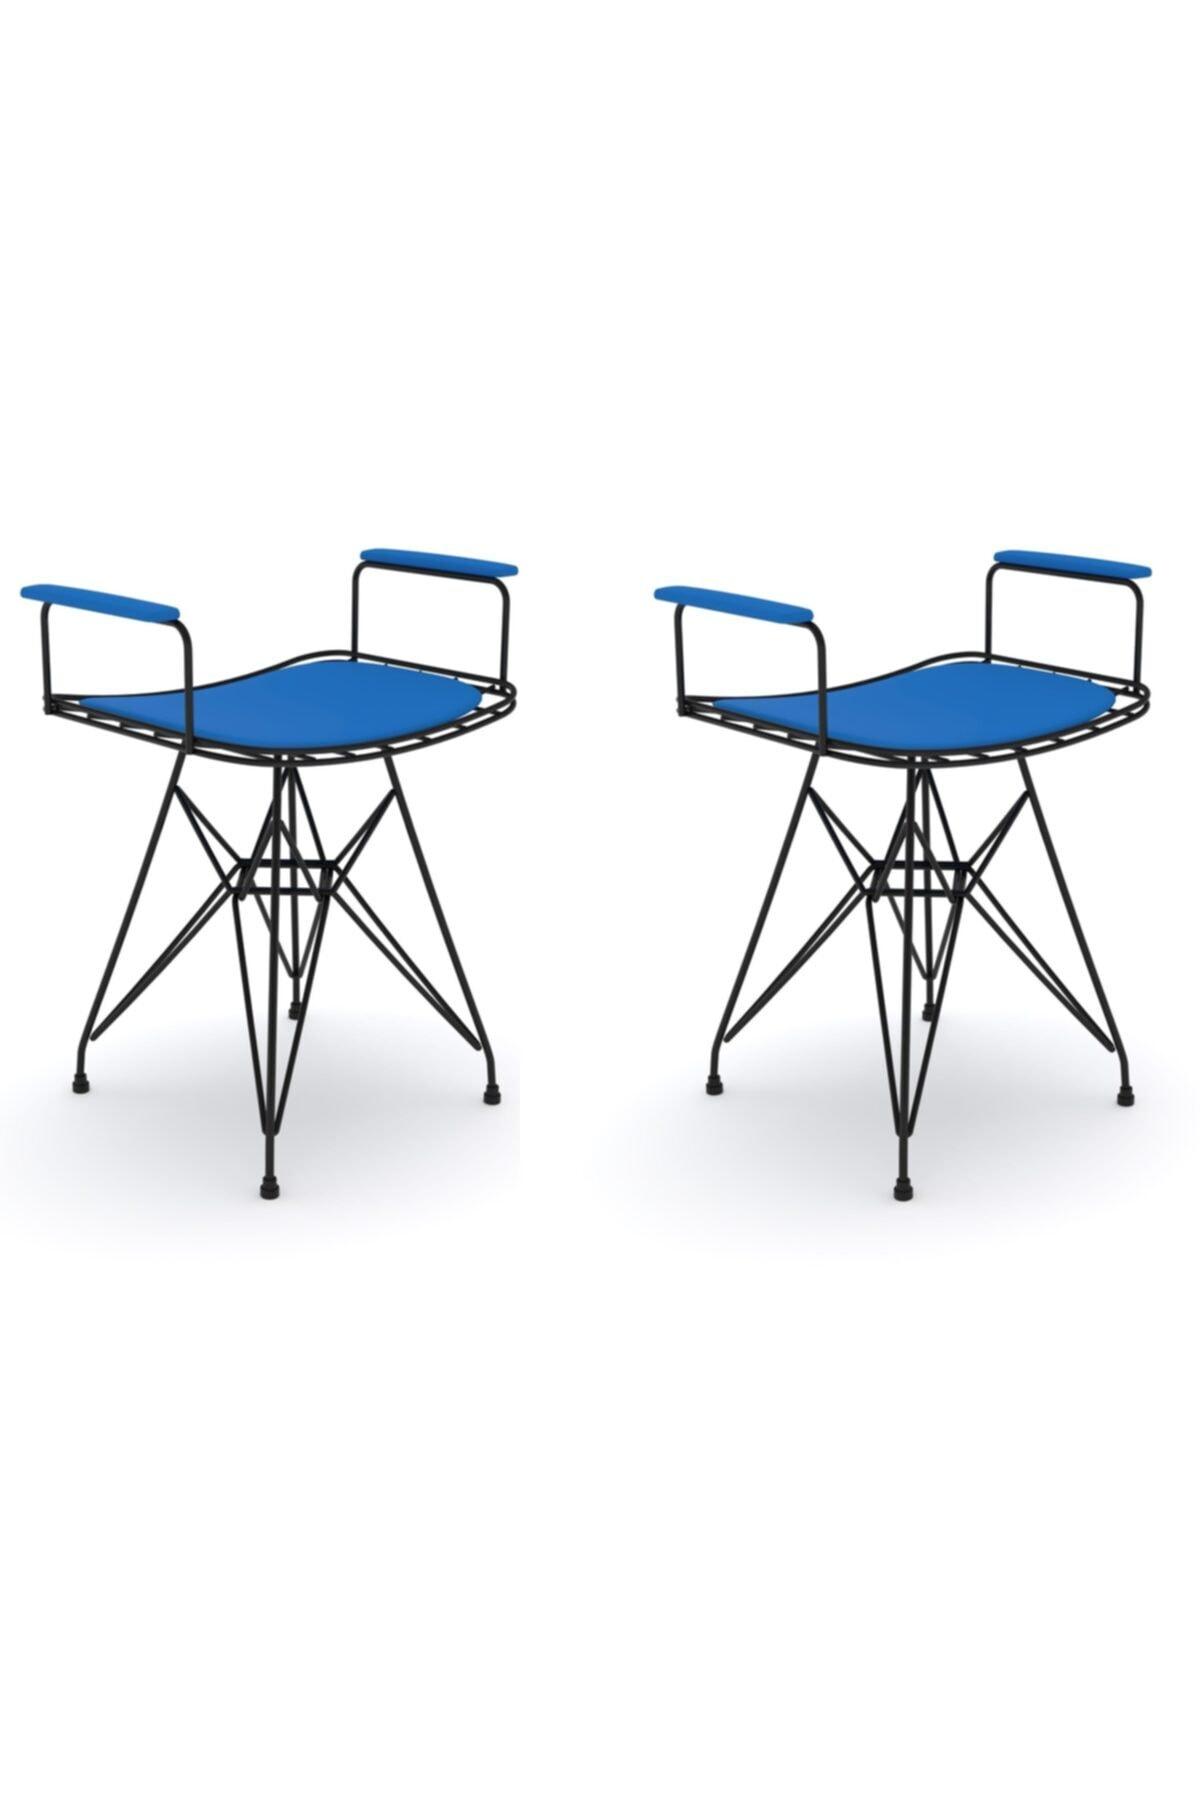 Knsz Kafes Tel Sandalyesi Tabure 2 Li Mutlu Syhmvi Kolçaklı Ofis Cafe Bahçe Mutfak